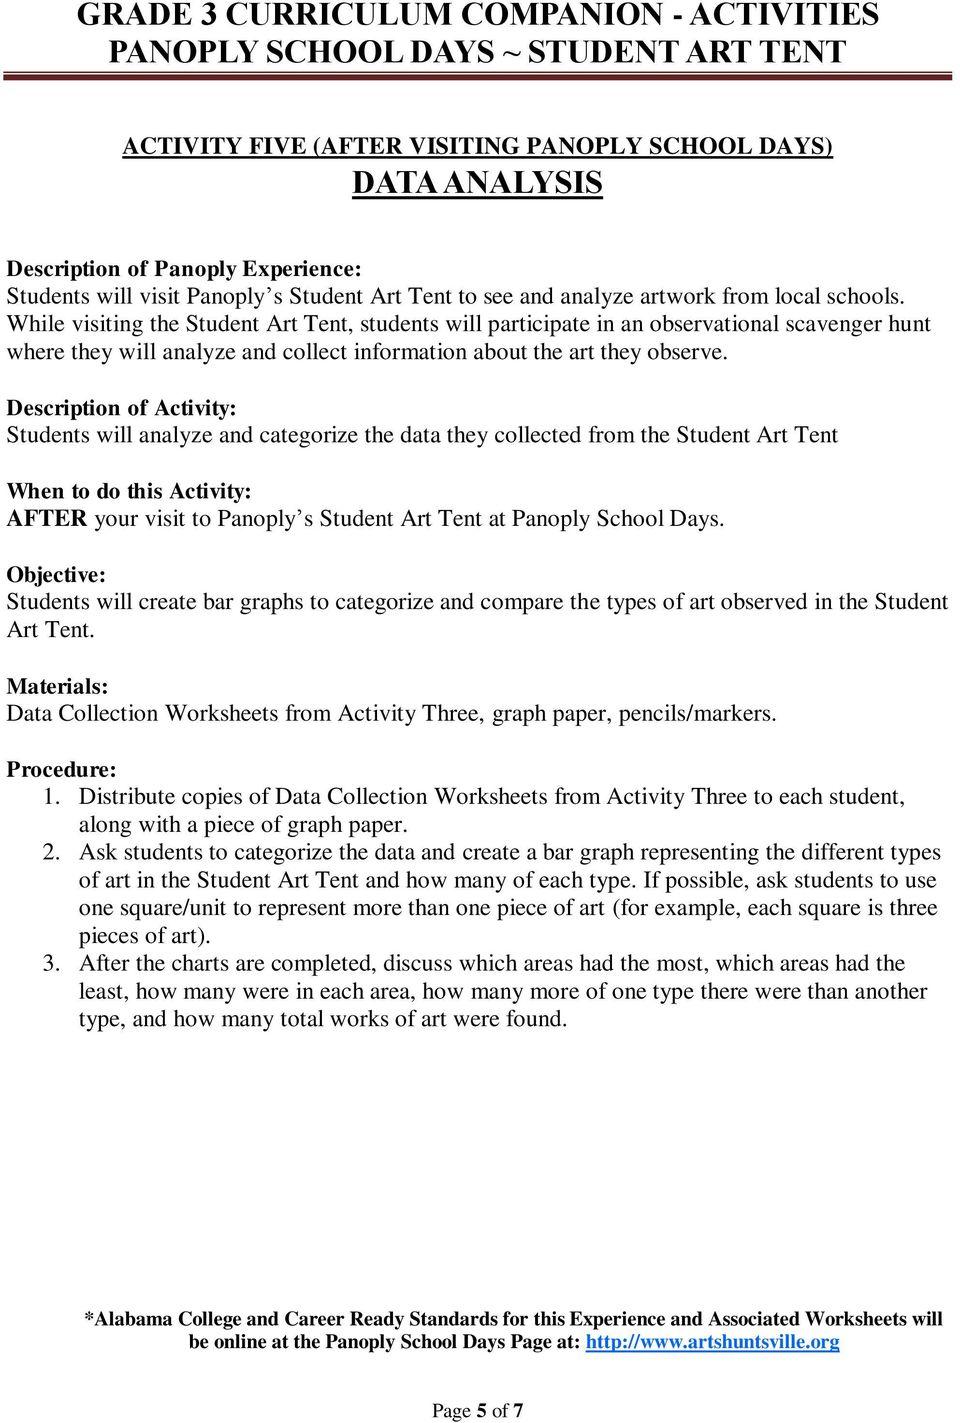 medium resolution of GRADE 3 CURRICULUM COMPANION - ACTIVITIES PANOPLY SCHOOL DAYS ~ STUDENT ART  TENT - PDF Free Download